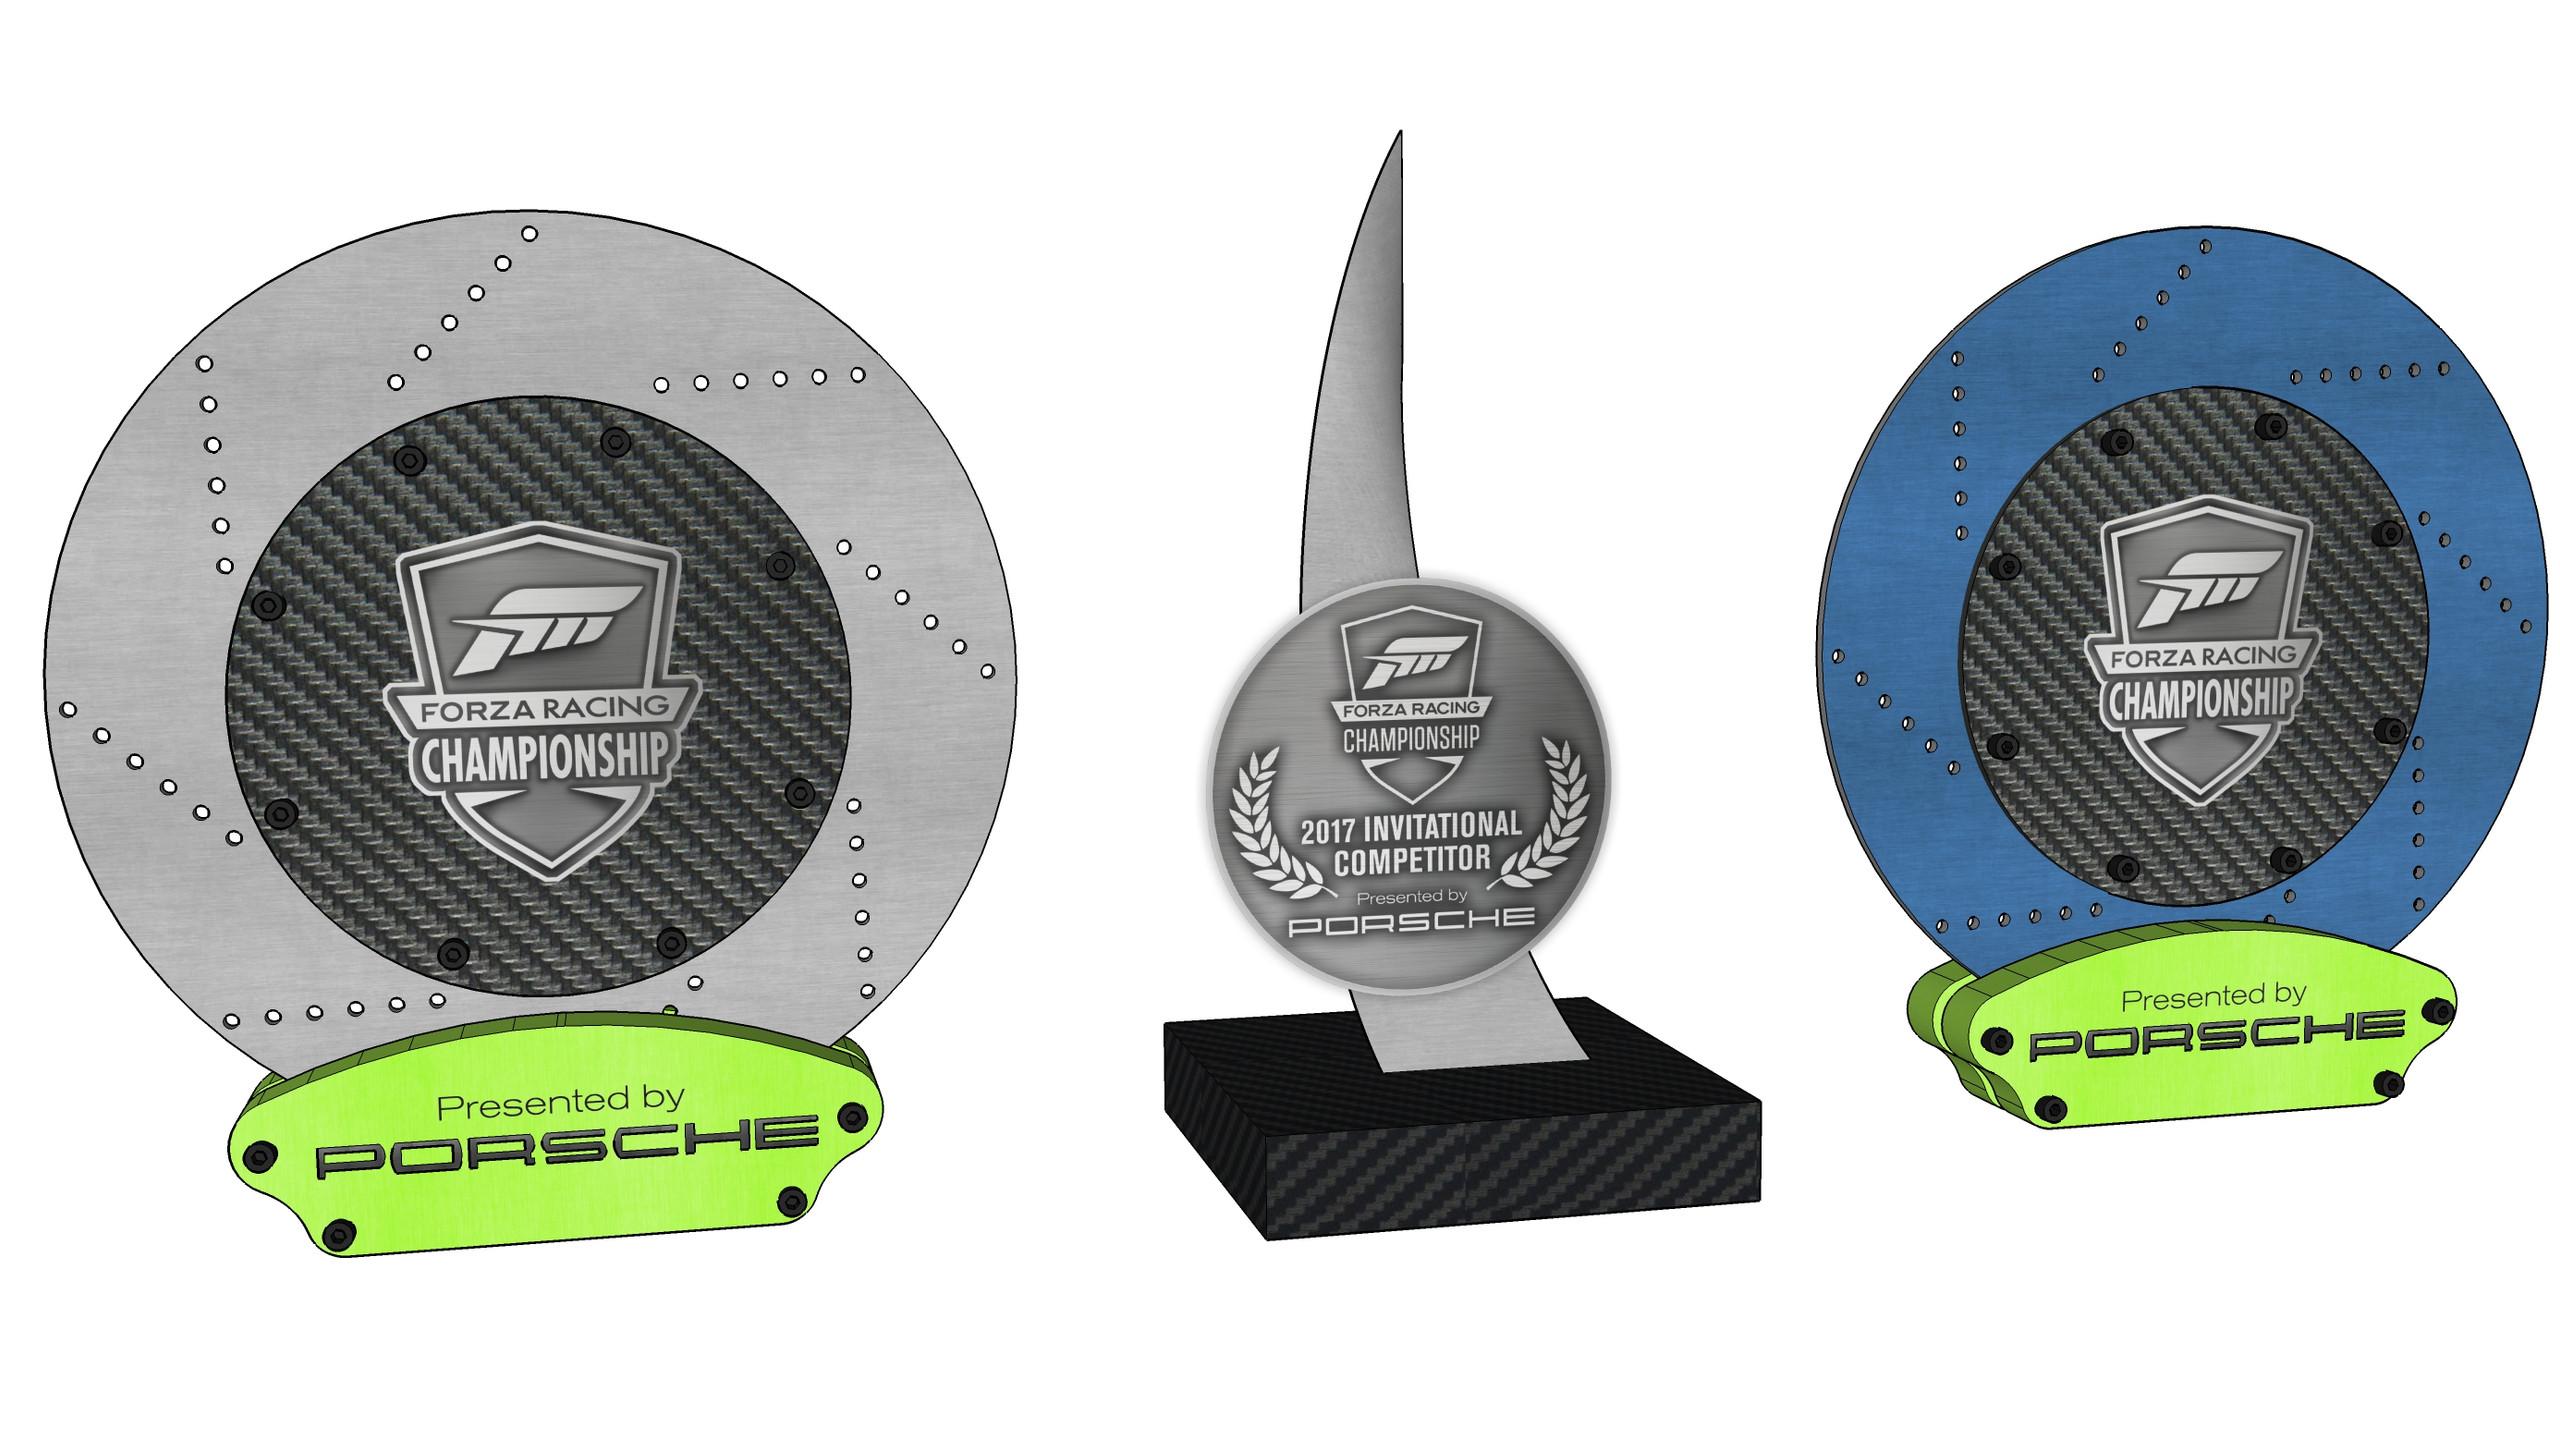 Forza Racing Trophy Mockup